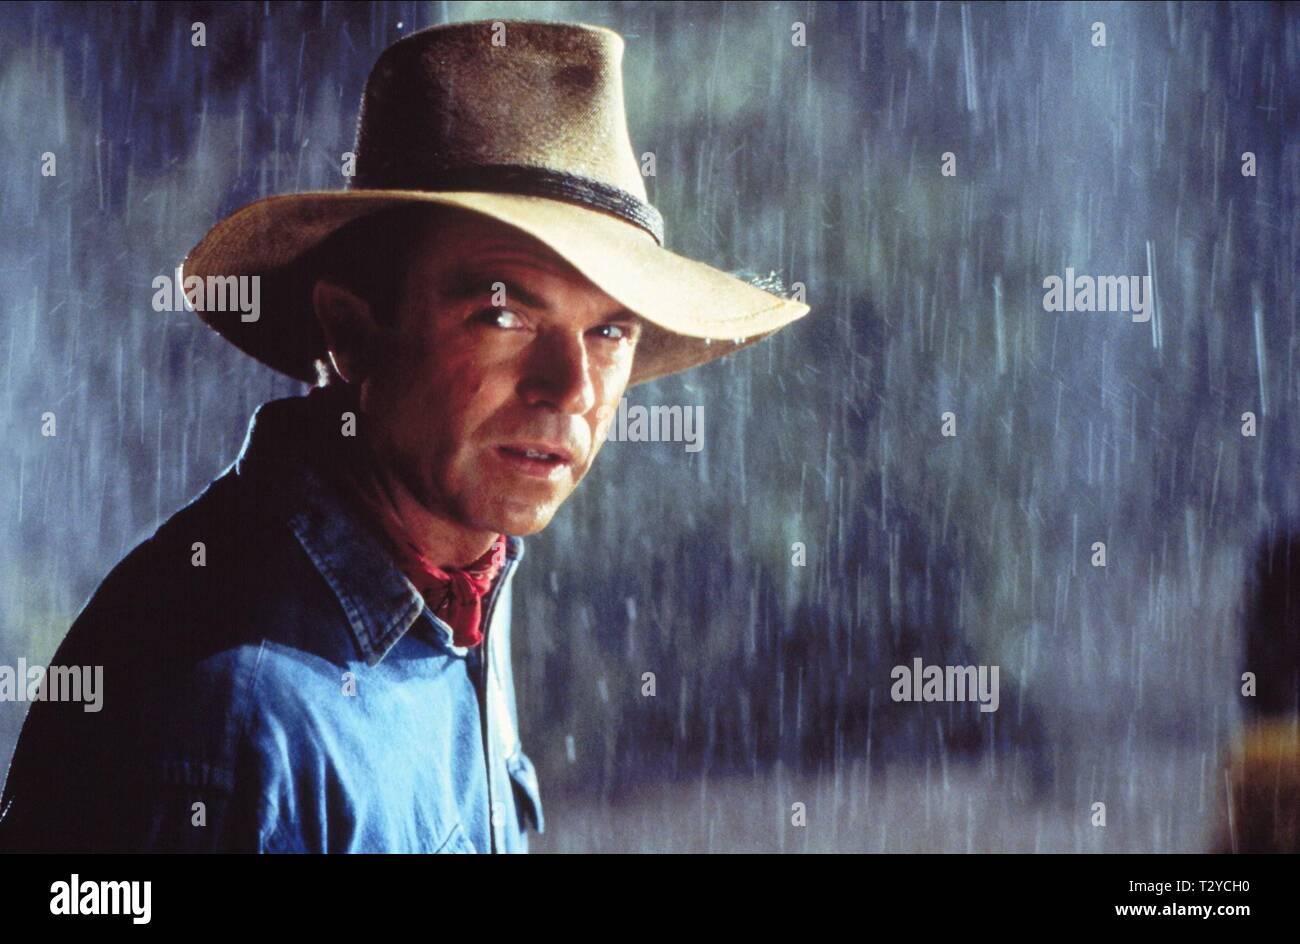 SAM NEILL, JURASSIC PARK, 1993 - Stock Image